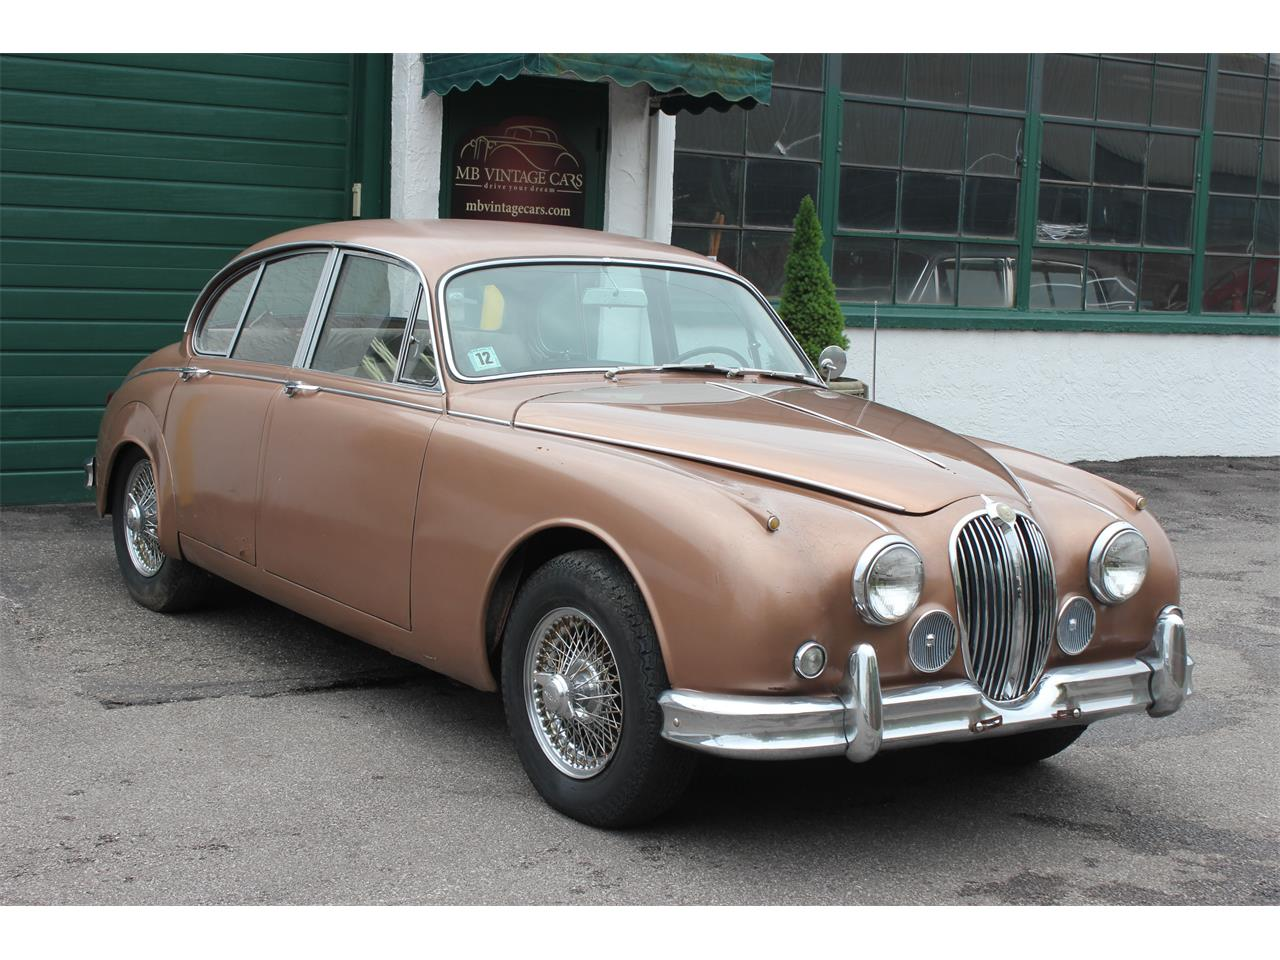 1963 Jaguar Mark II for Sale | ClassicCars.com | CC-983235